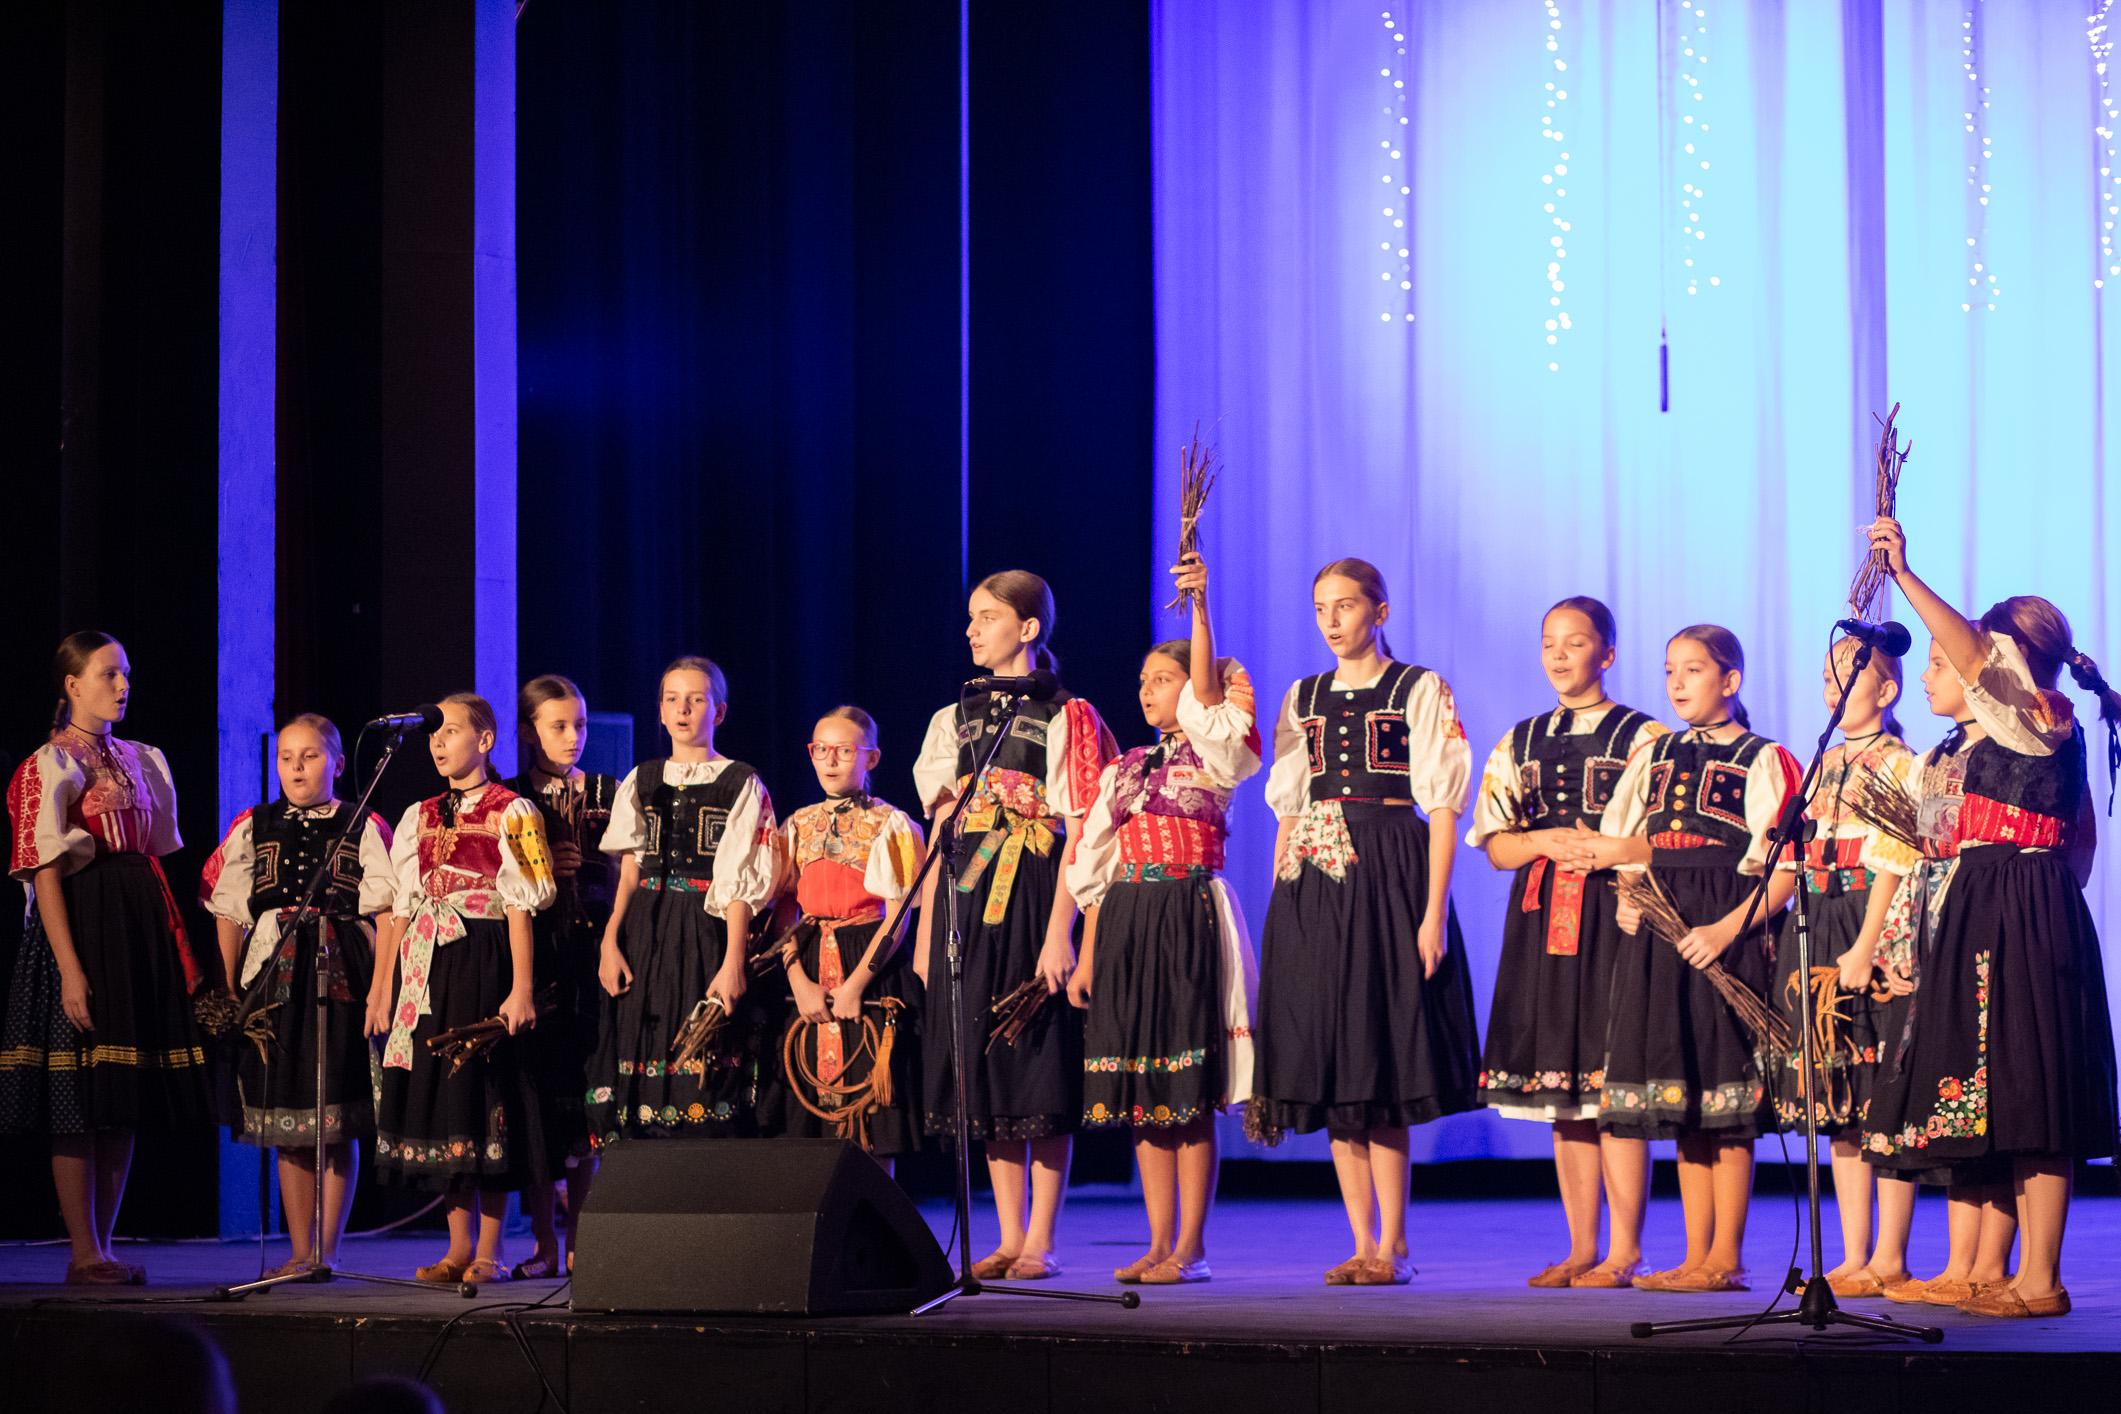 nadych-vianoc-zornicka-marina-7